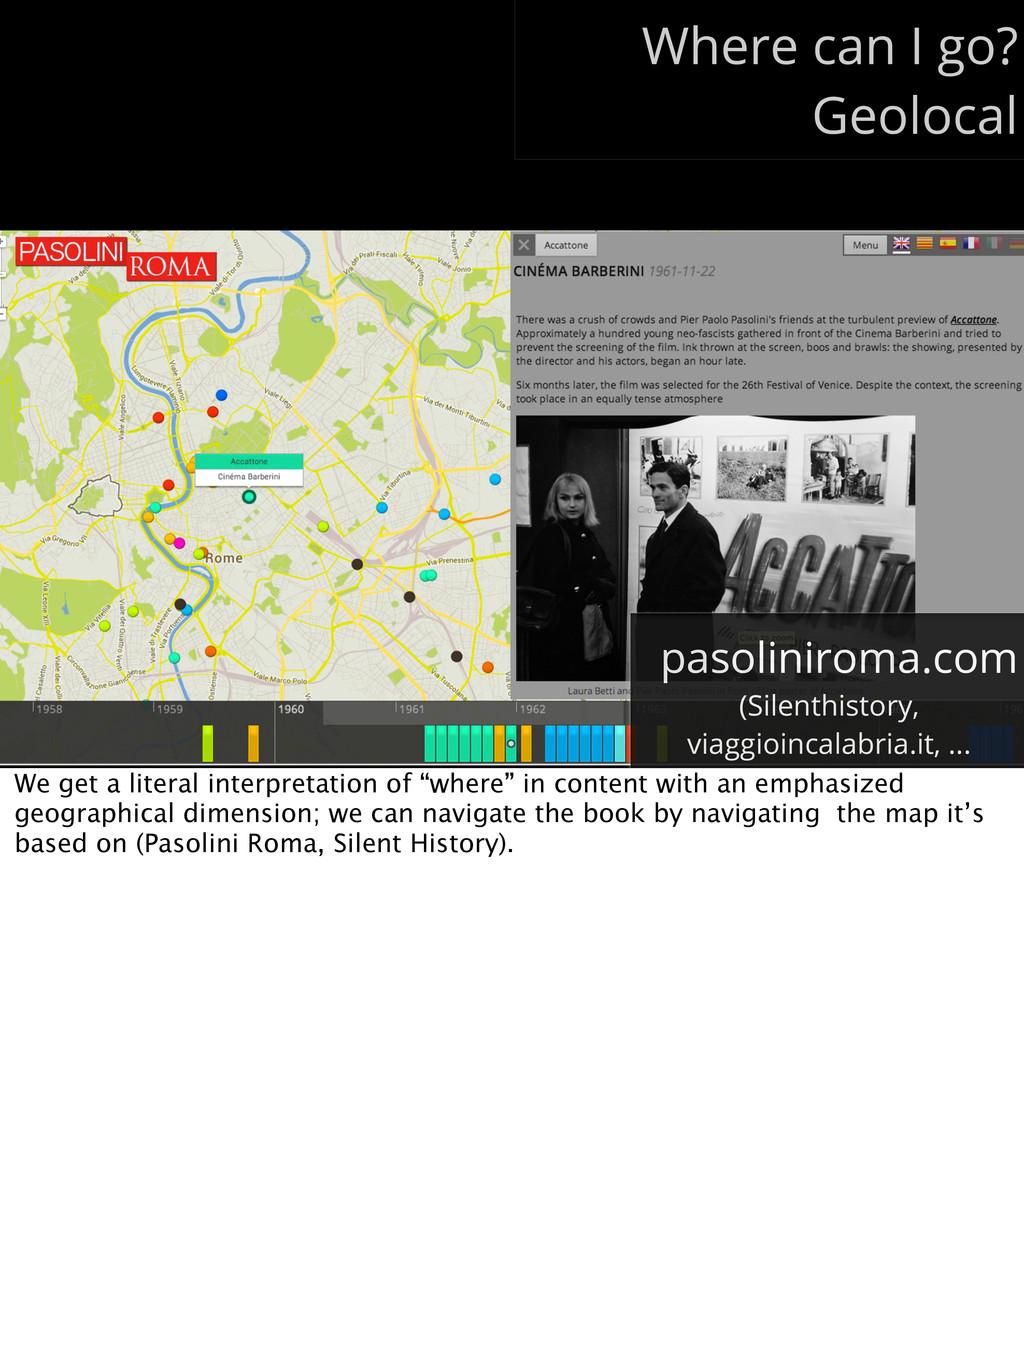 Where can I go? Geolocal pasoliniroma.com (Sile...